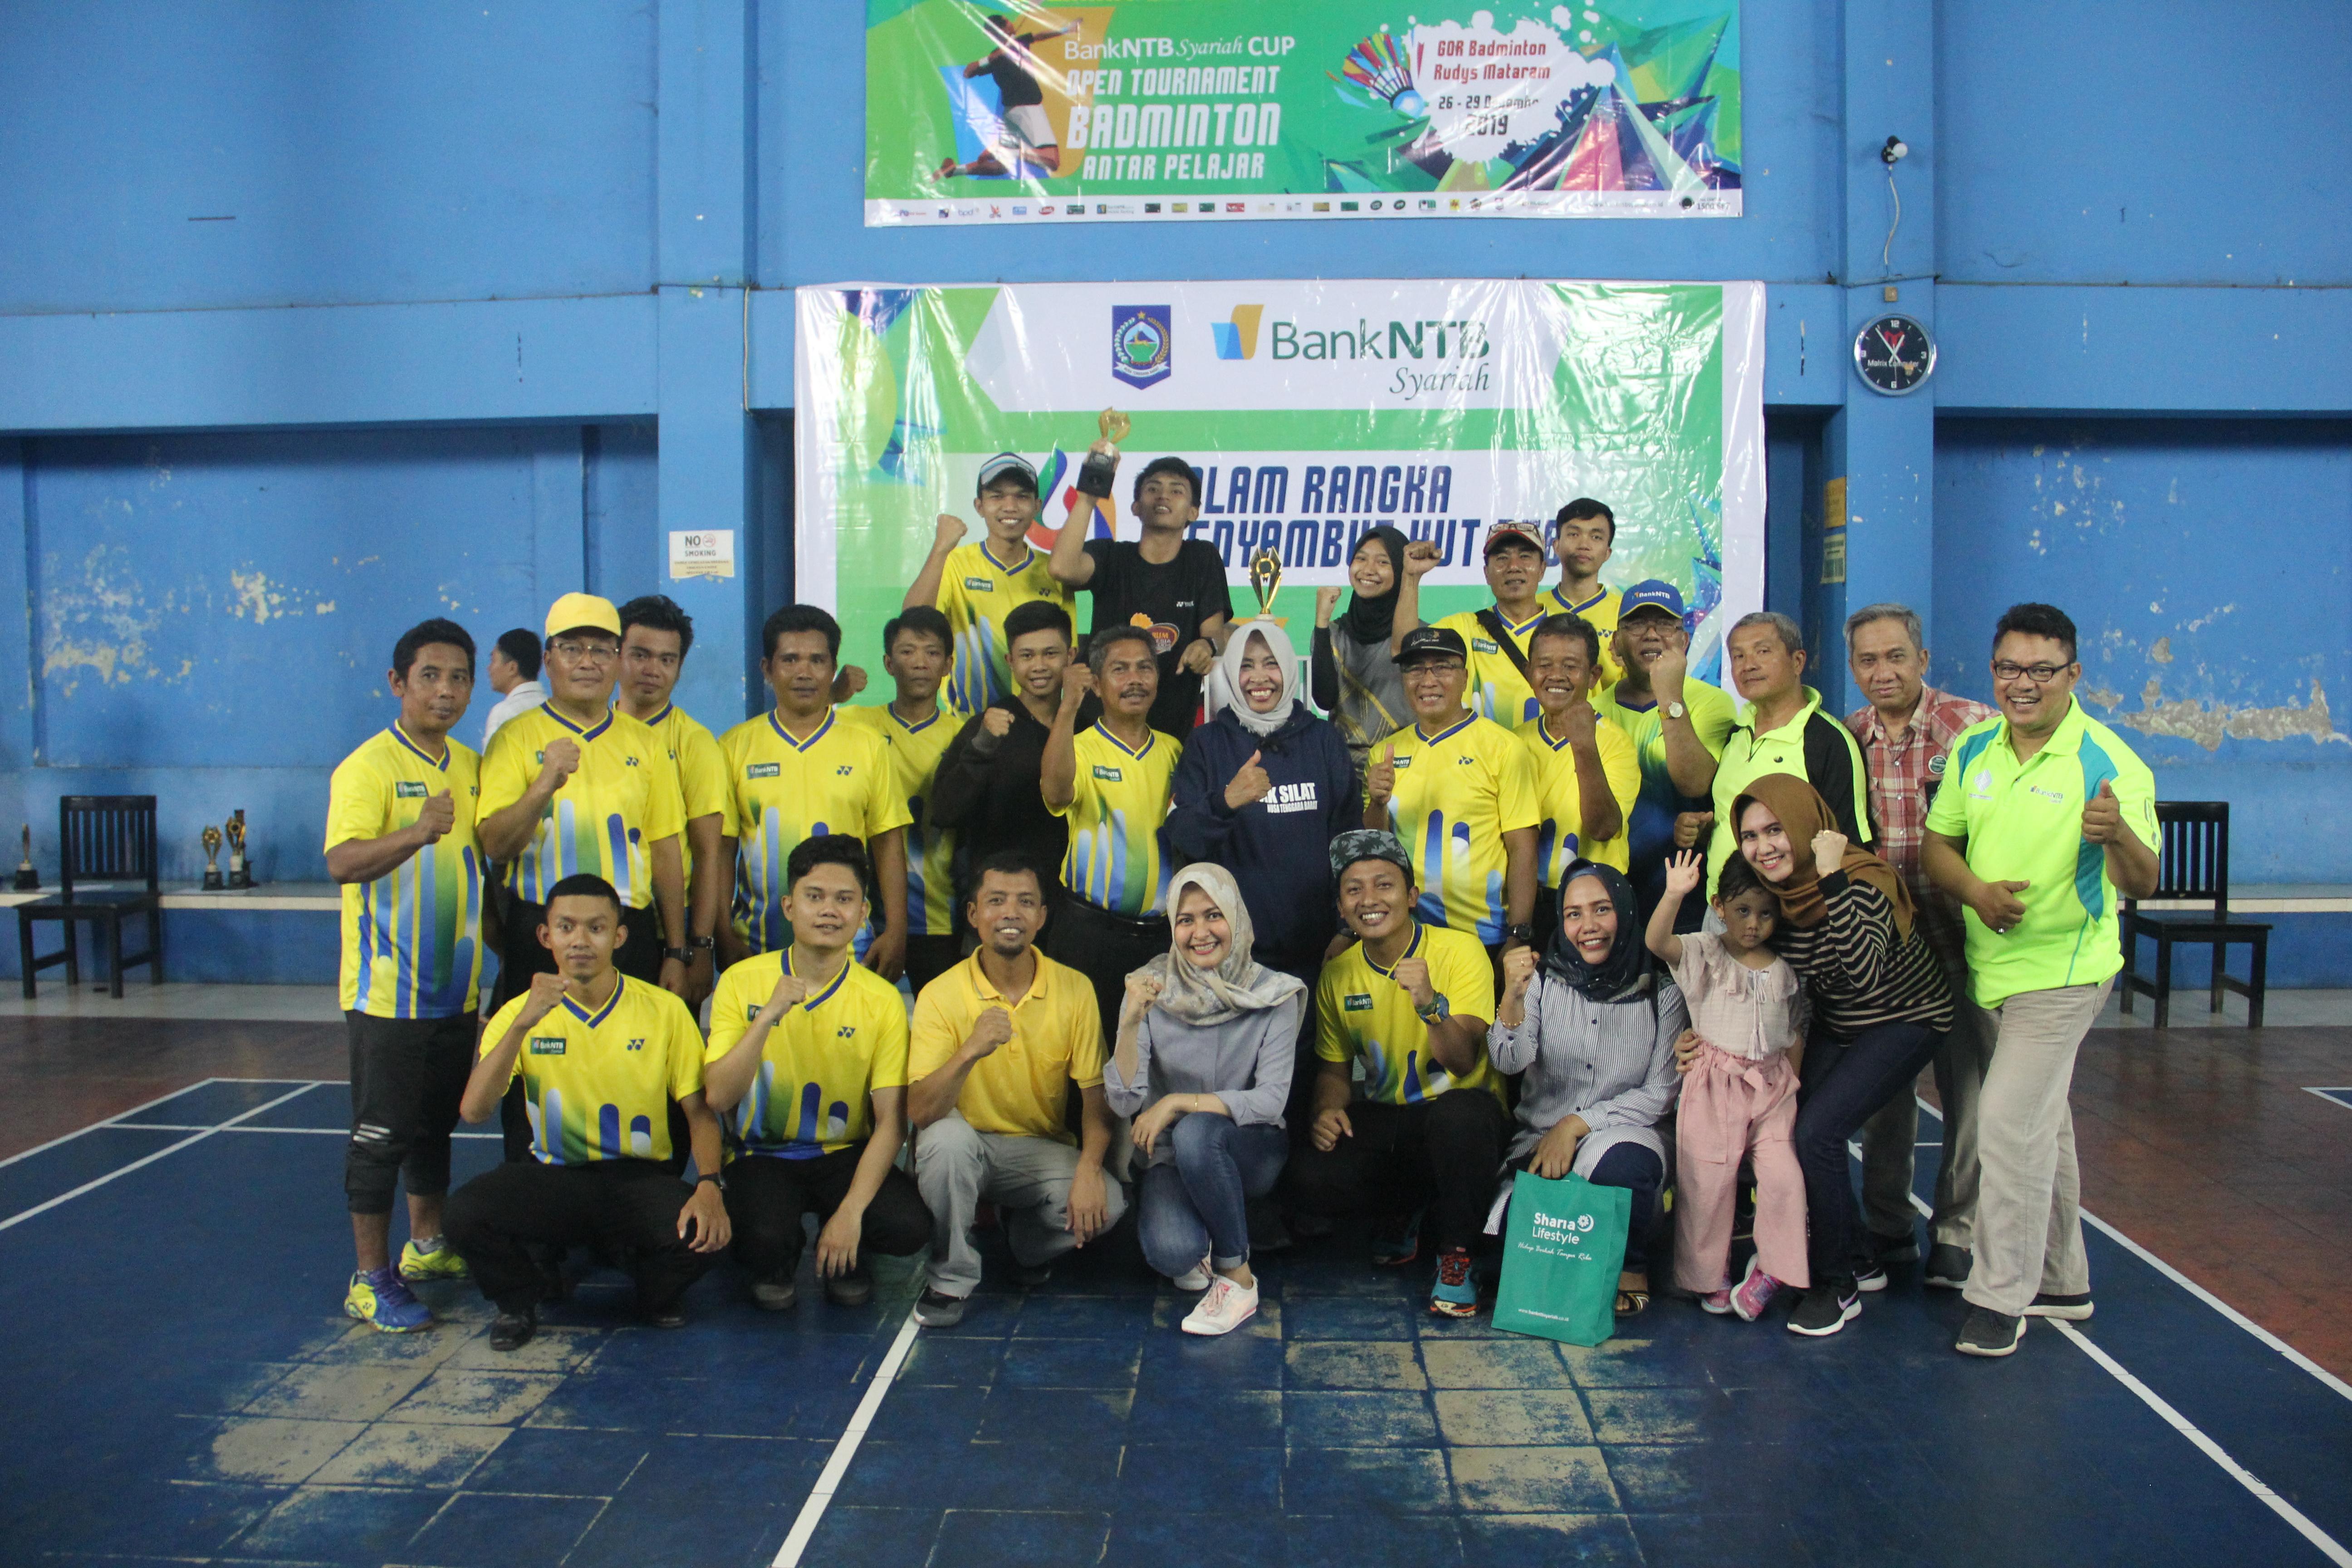 radarlombok-co-id-SMAN-1-Pemenang-Juara-Umum-Bank-NTB-Syariah-Cup-2019-